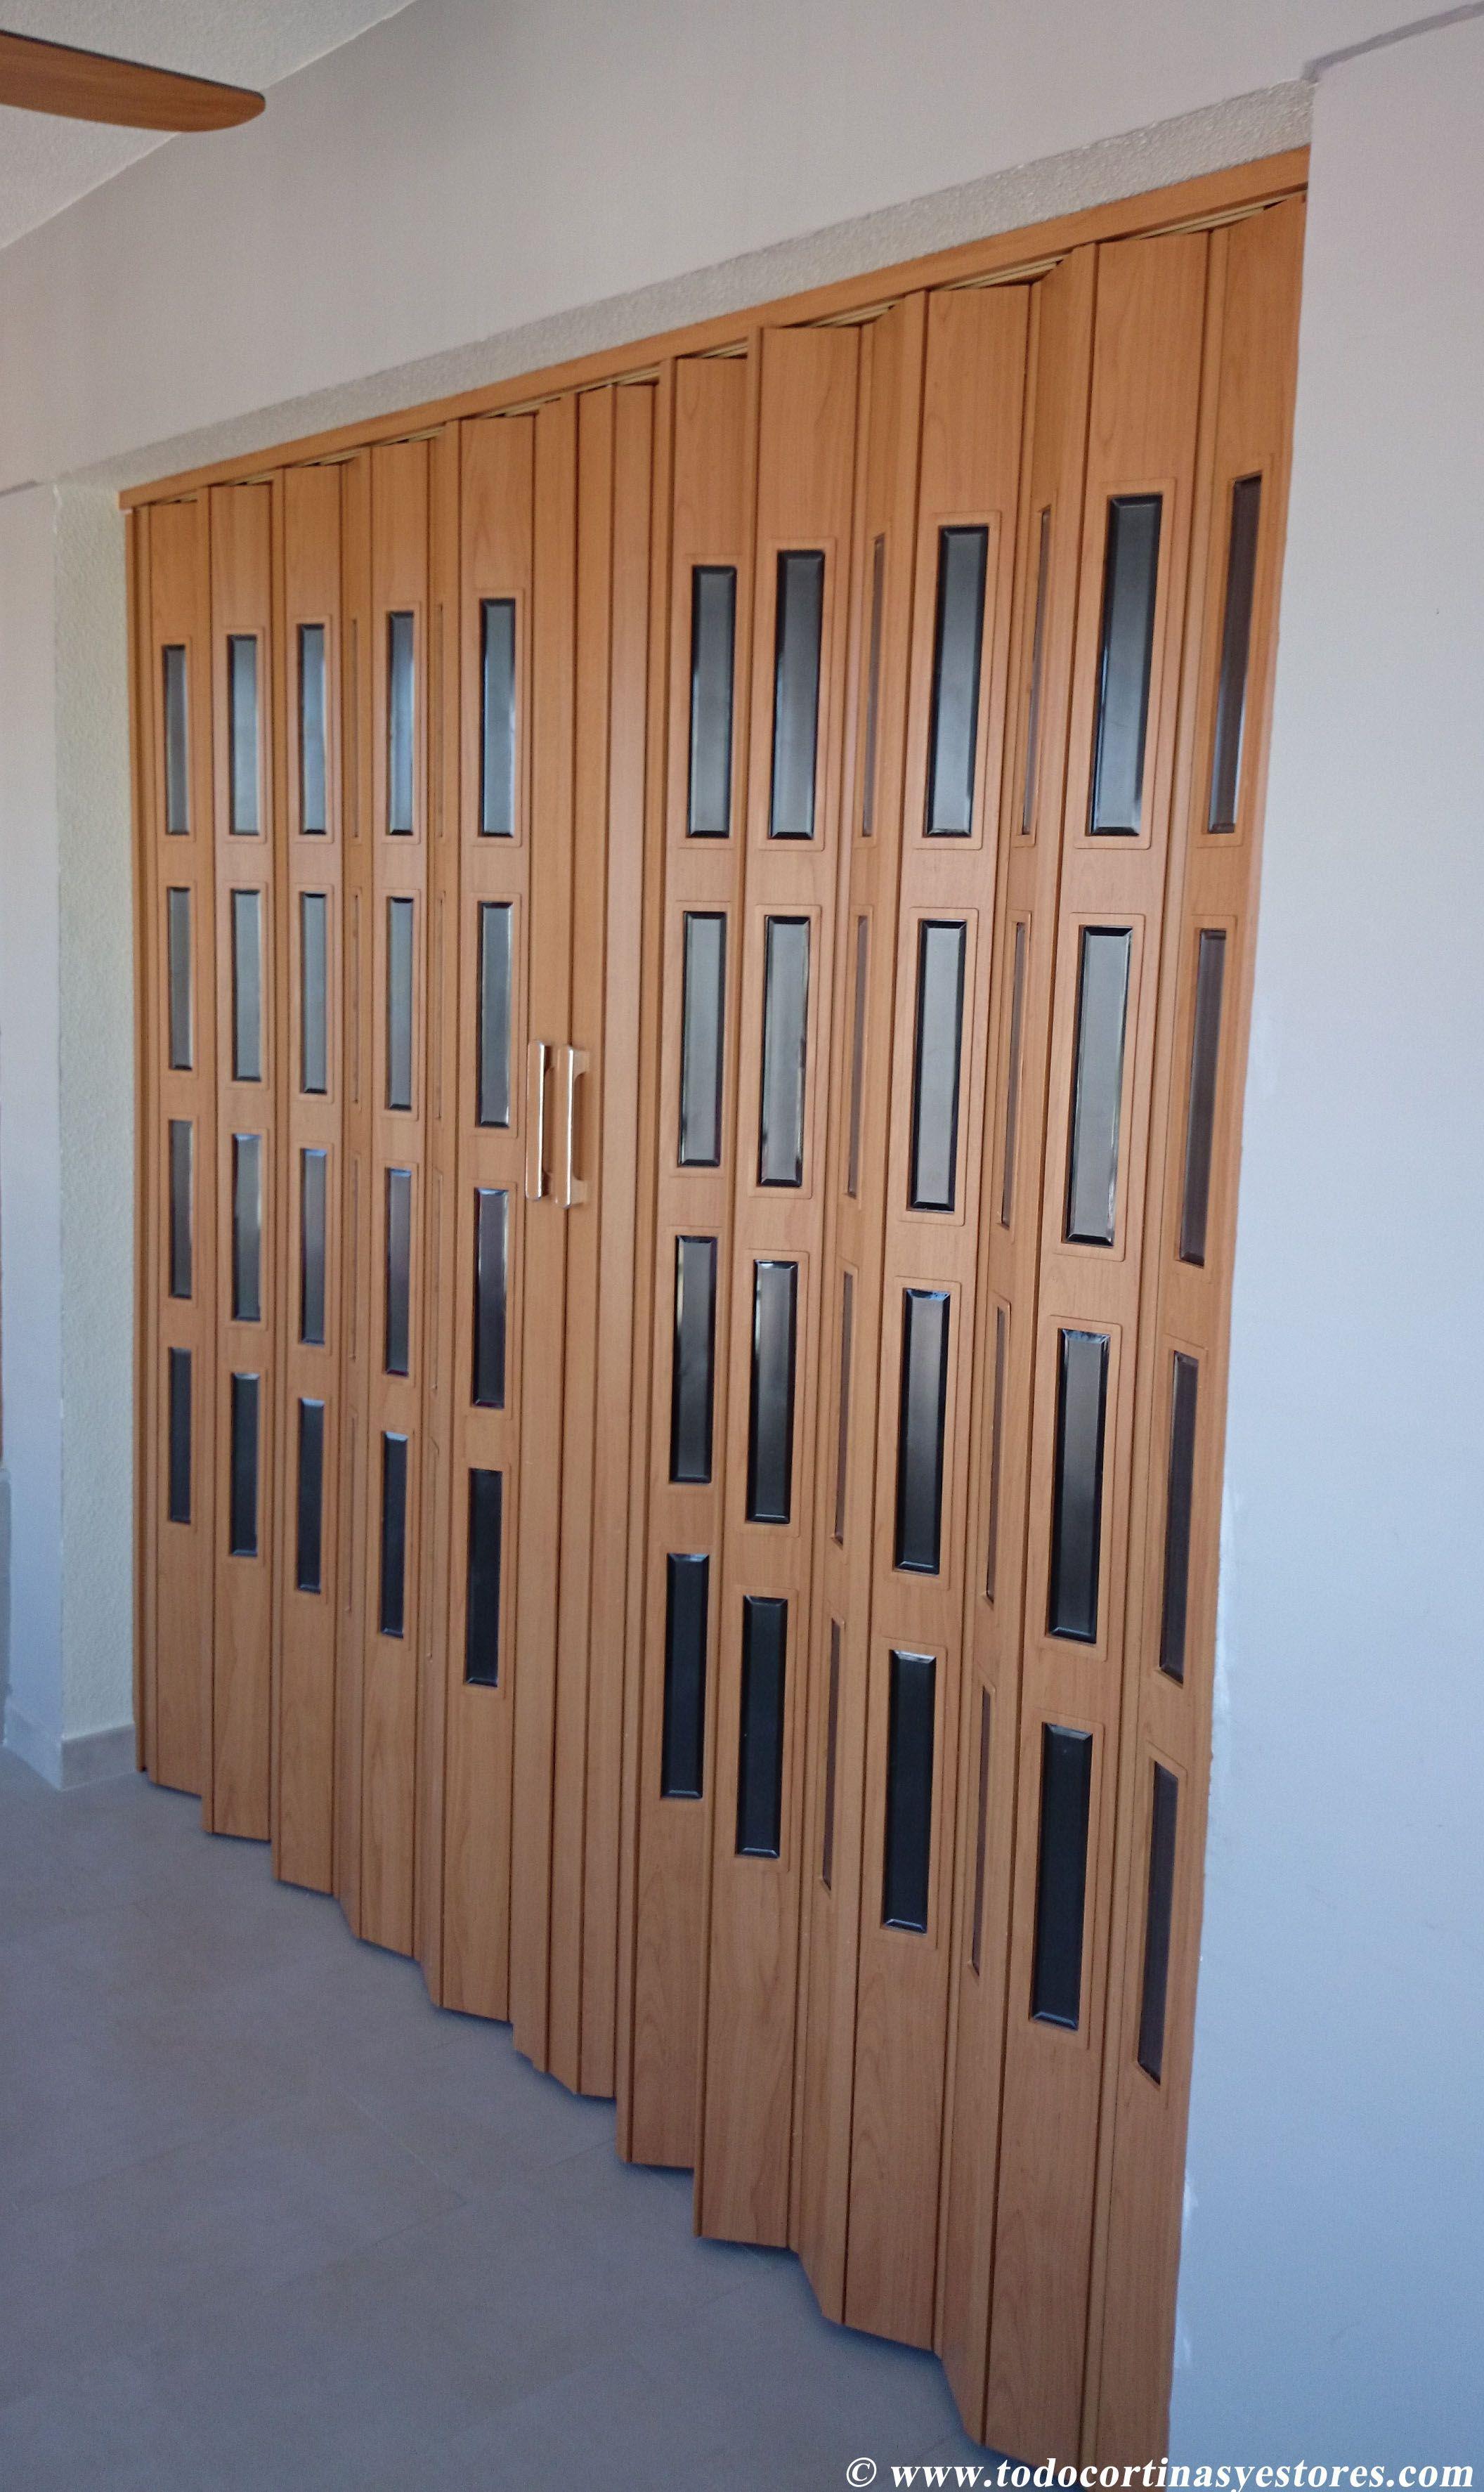 Puerta plegable de pvc banos pinterest puertas for Puertas plegables de interior